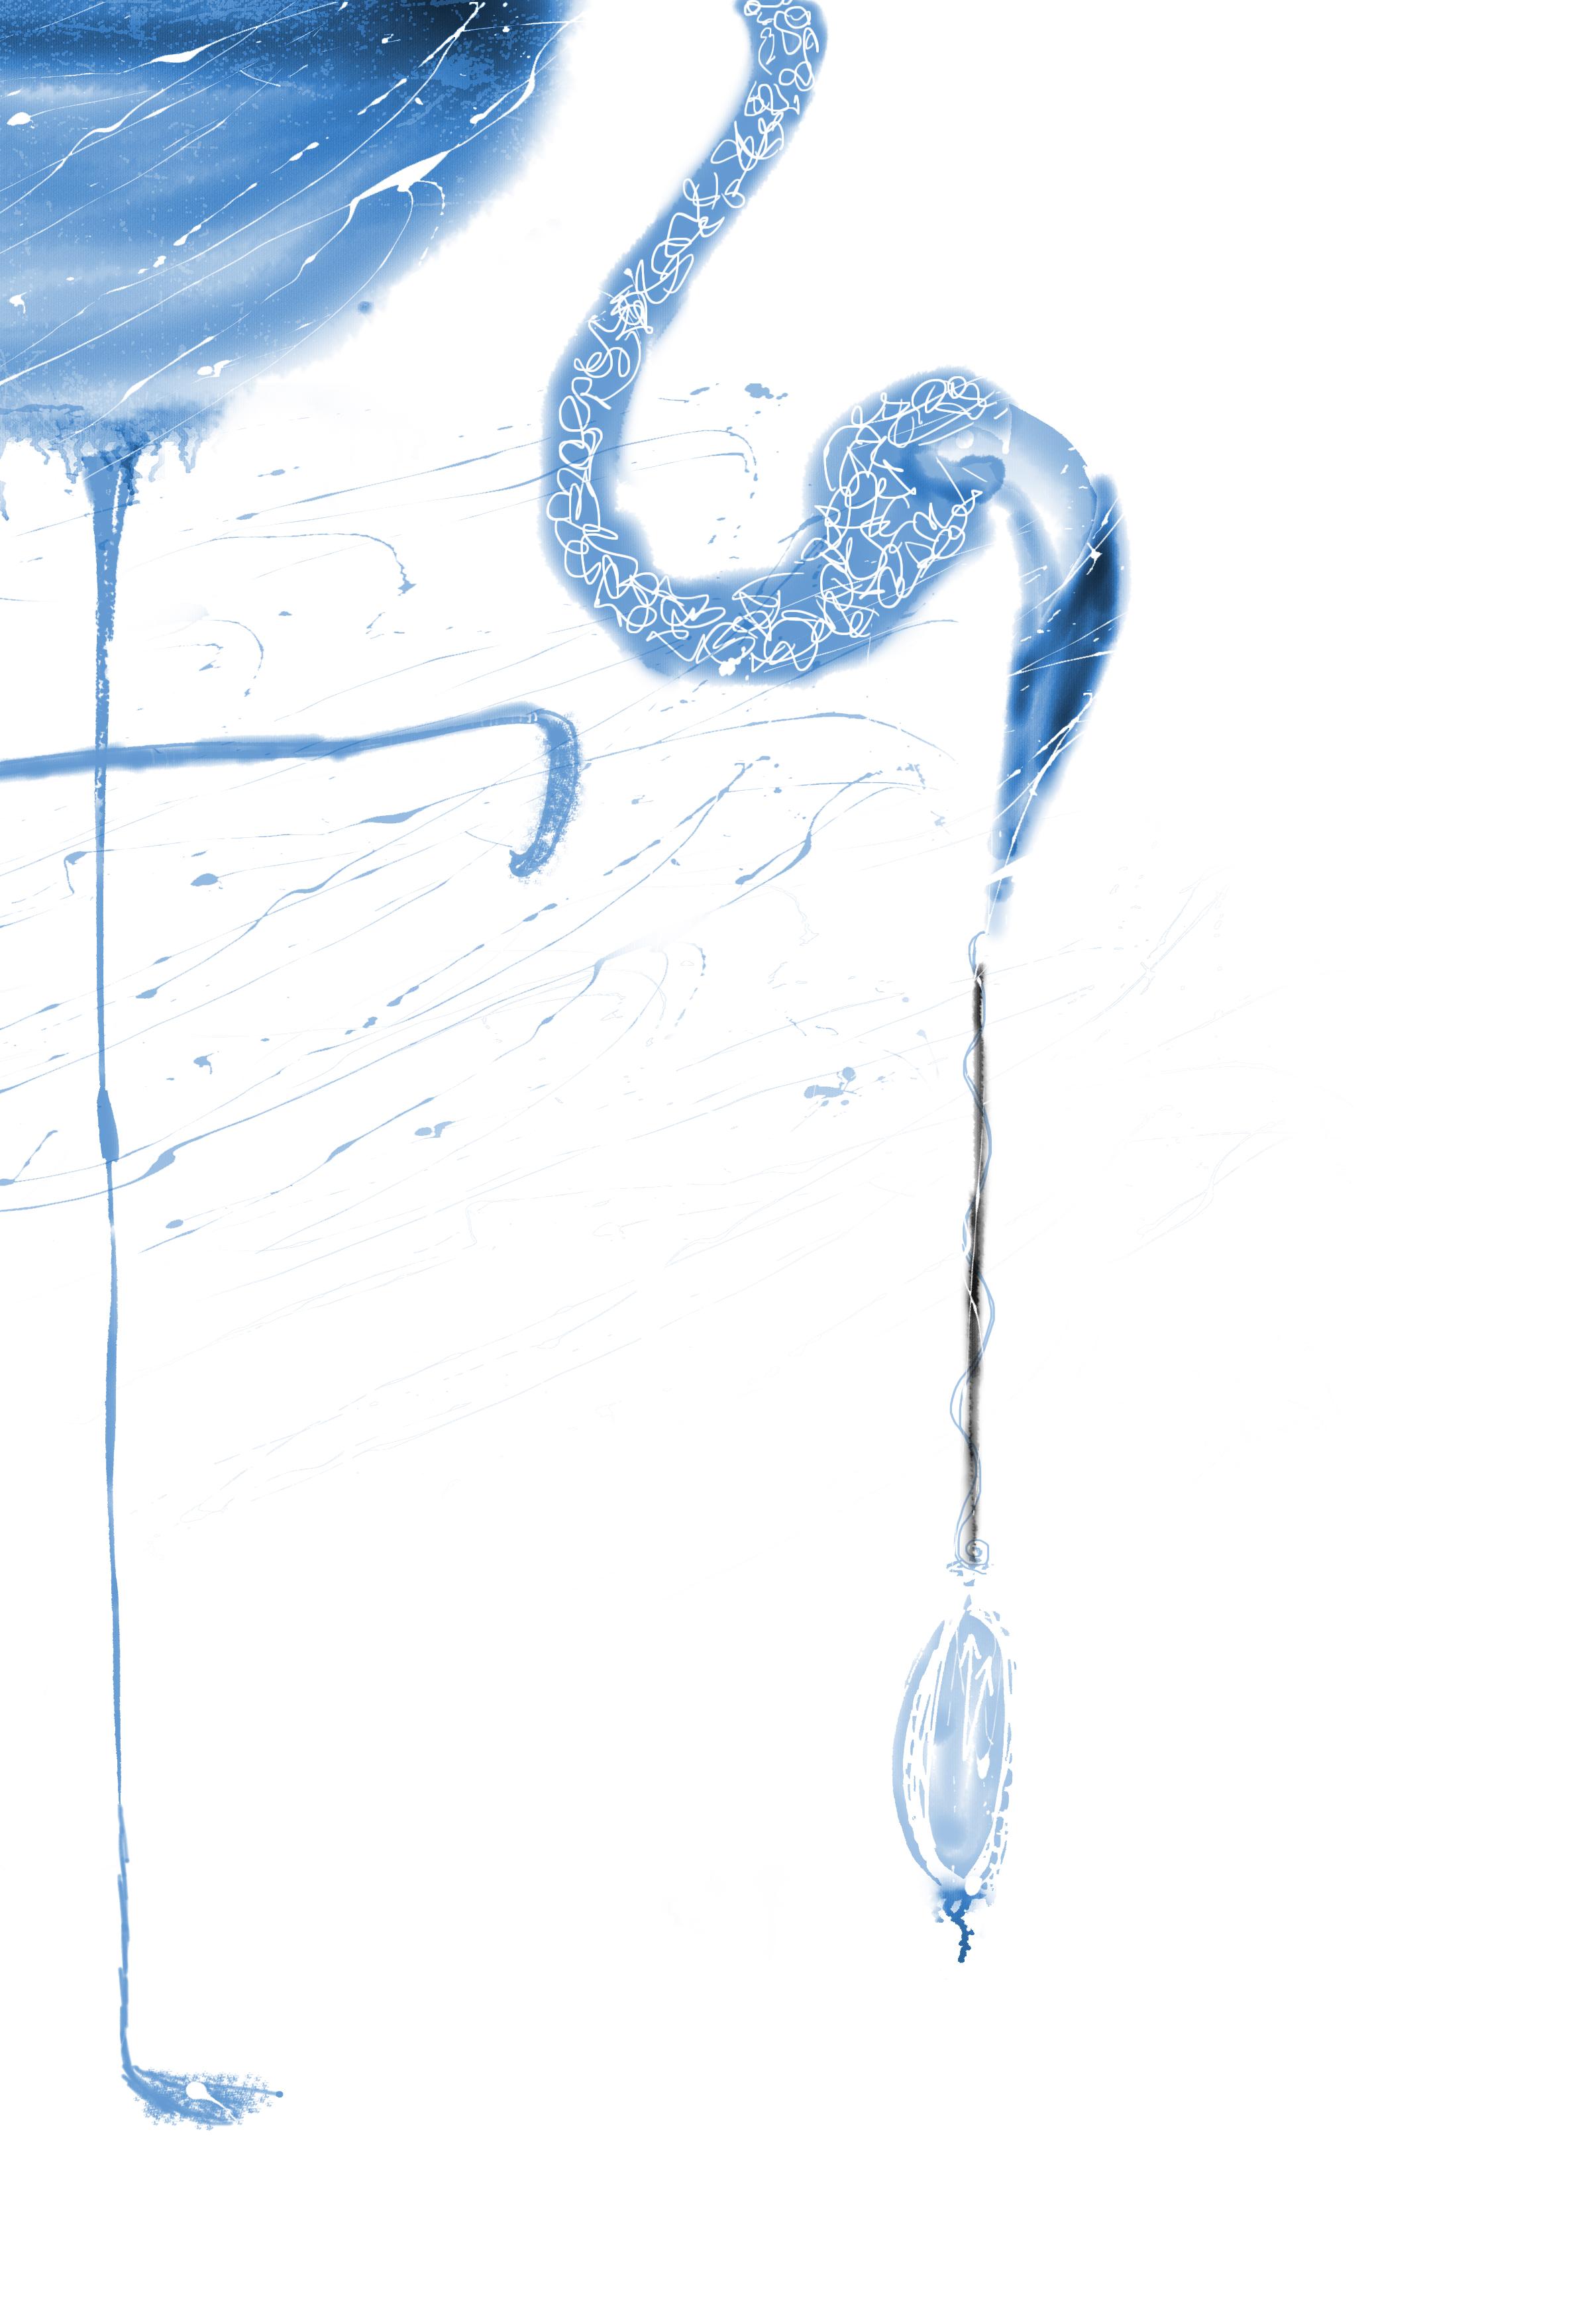 flamingo_clock_time_Alice_wonderland_natalie_palmer_sutton_illustration